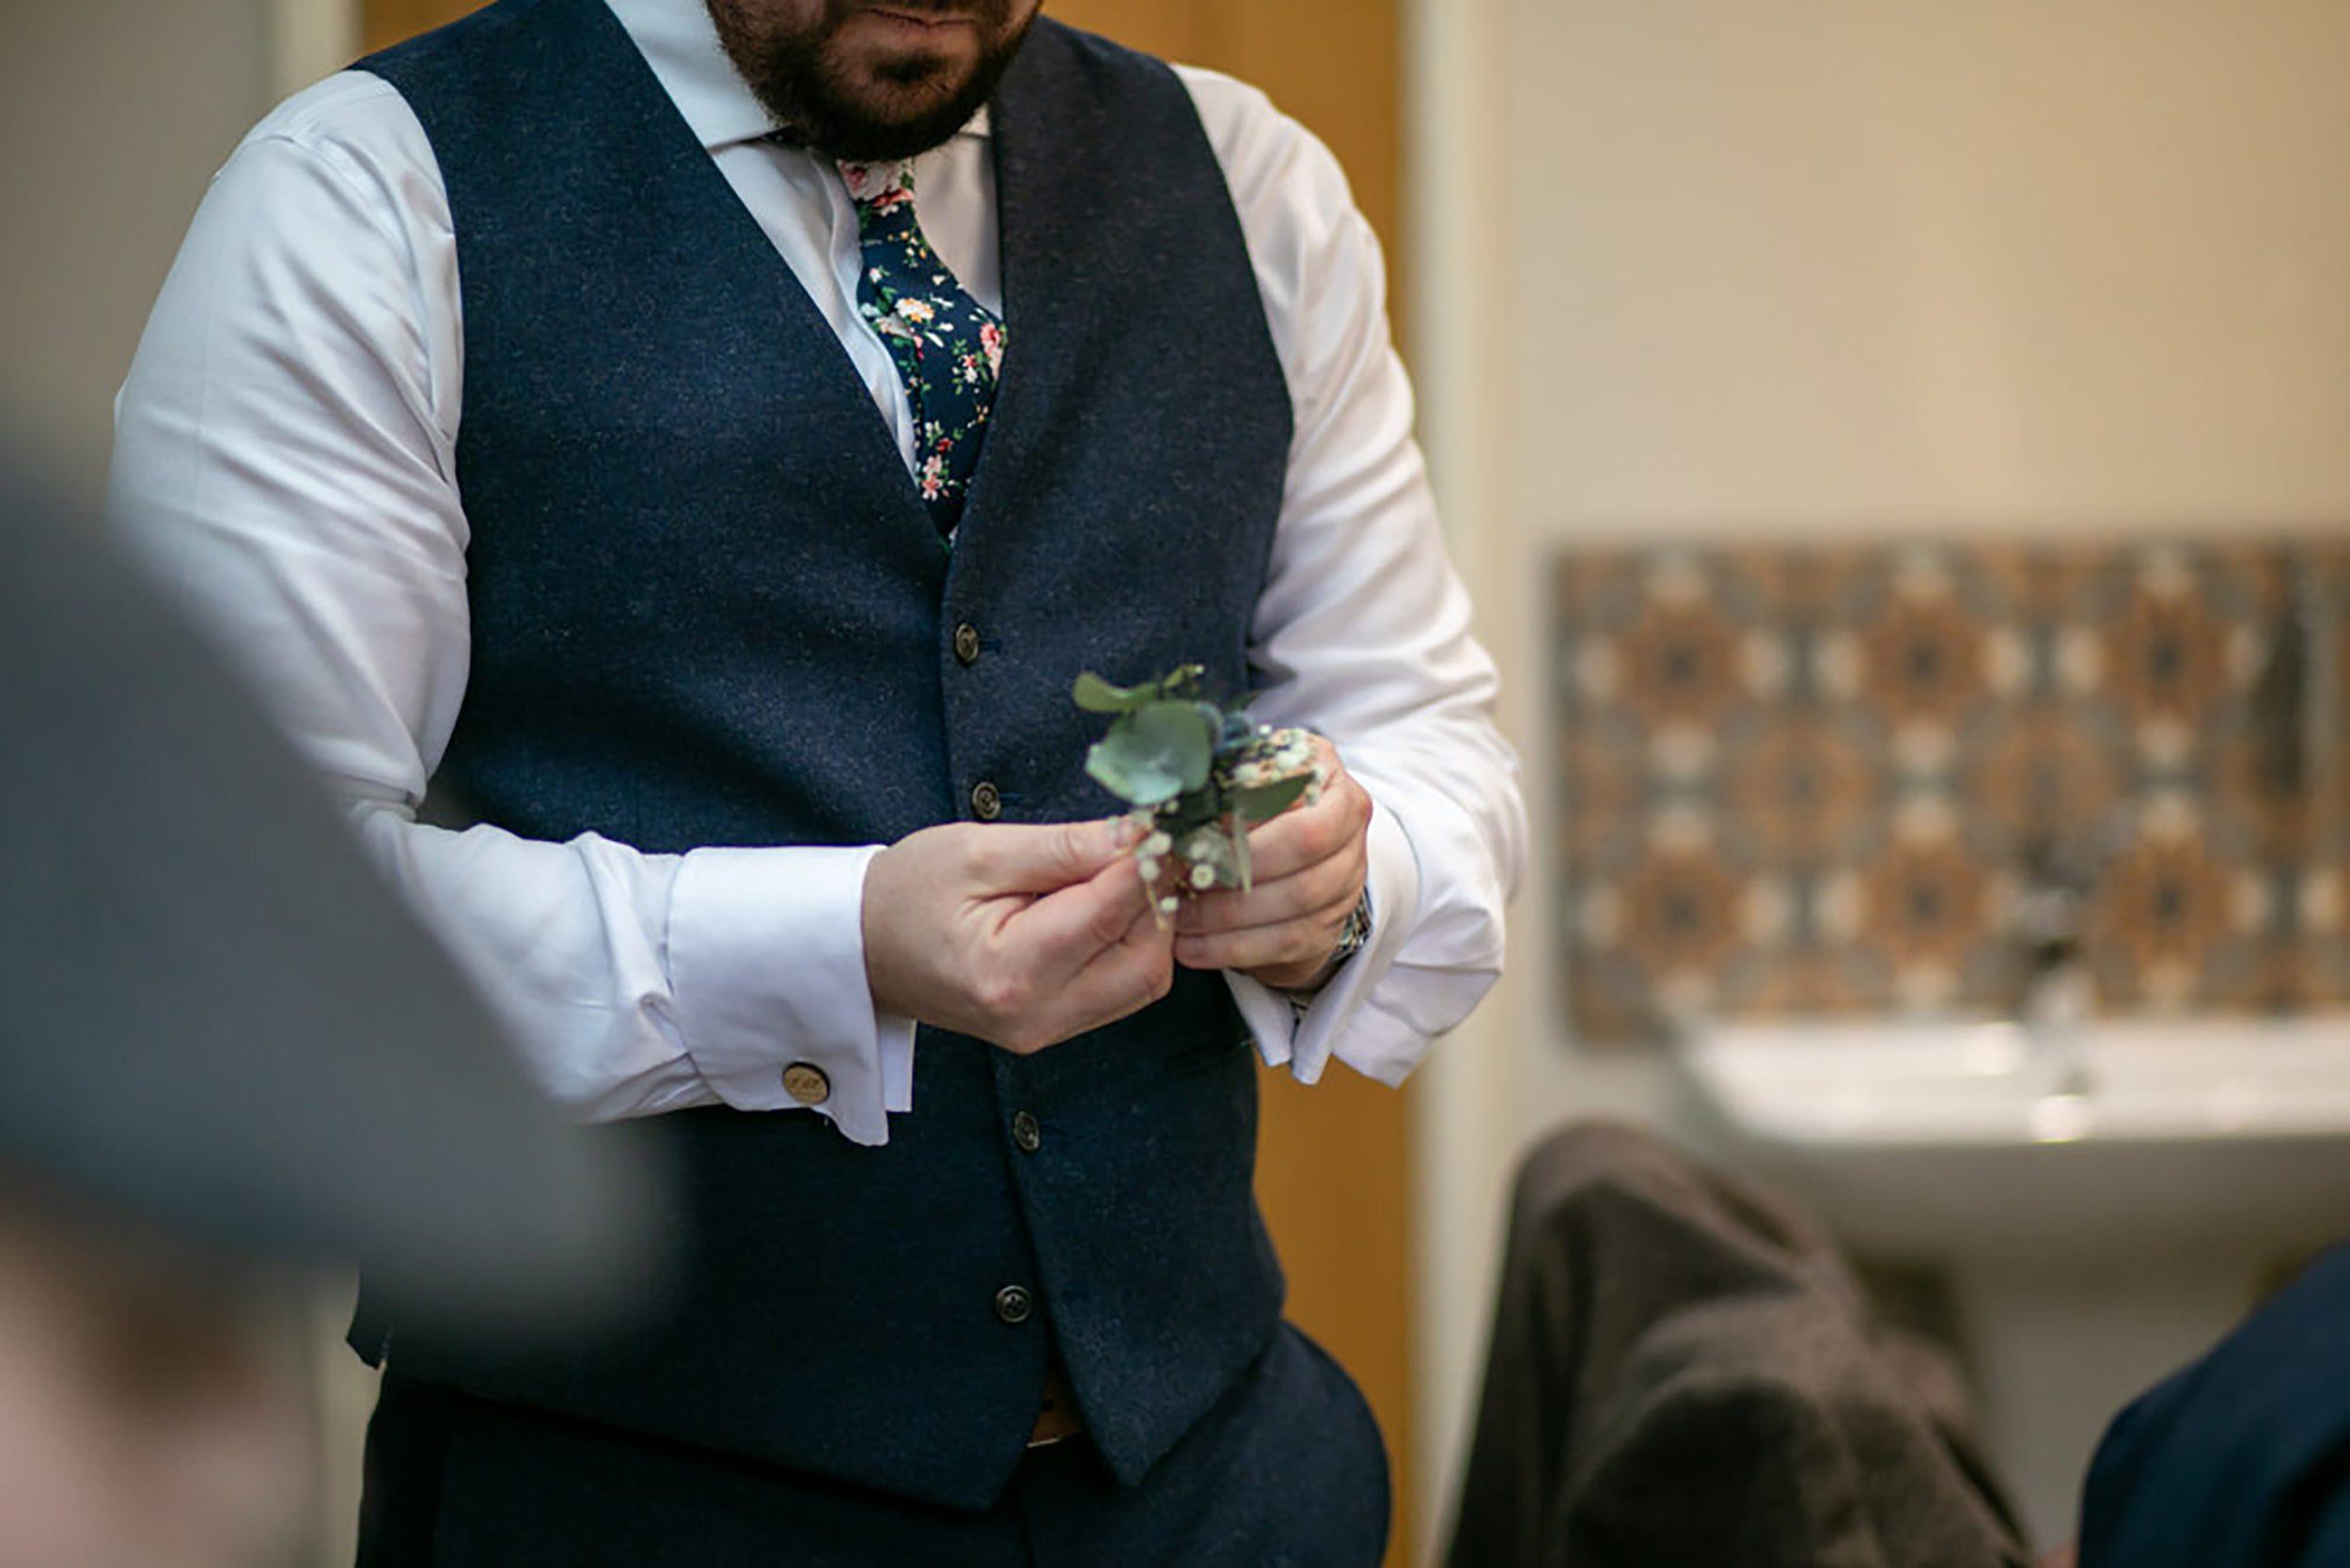 Groom prep and buttonholes Tower Hill Barns dressing room, Adam Joe Roberts Photography